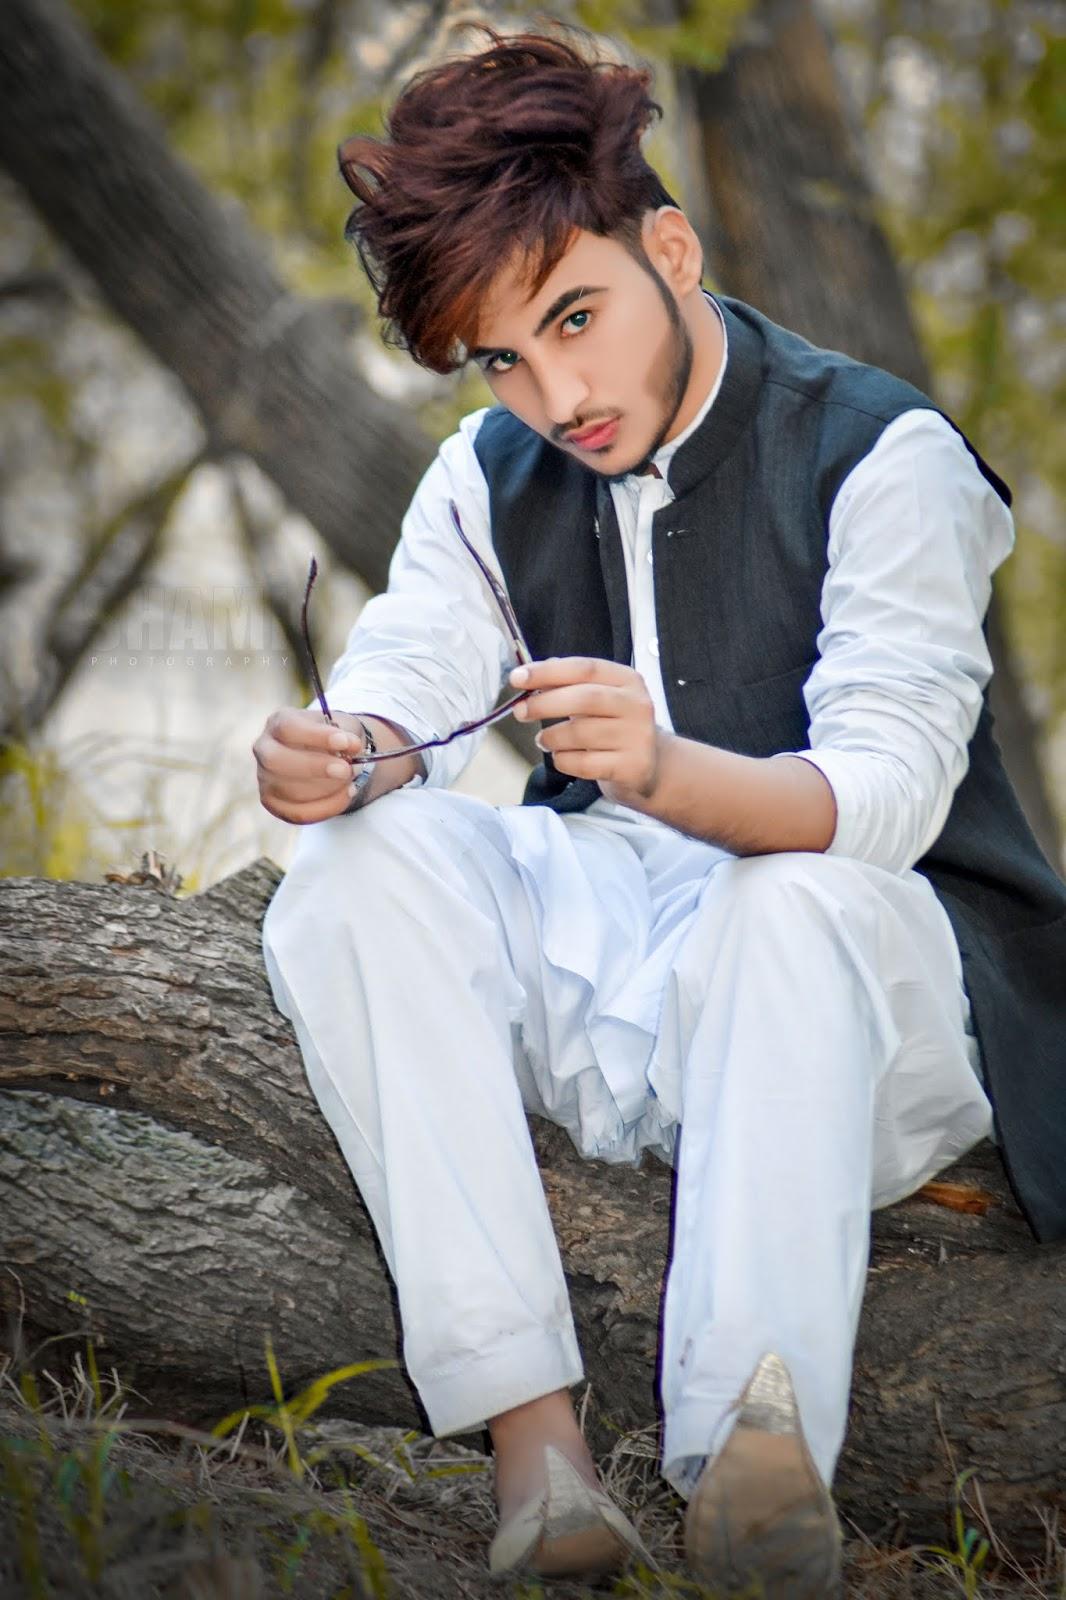 New Hair Style Boys 2020 New Pakistani Hairstyles For Boys 2020 Cool And Short Hairstyles For Boys